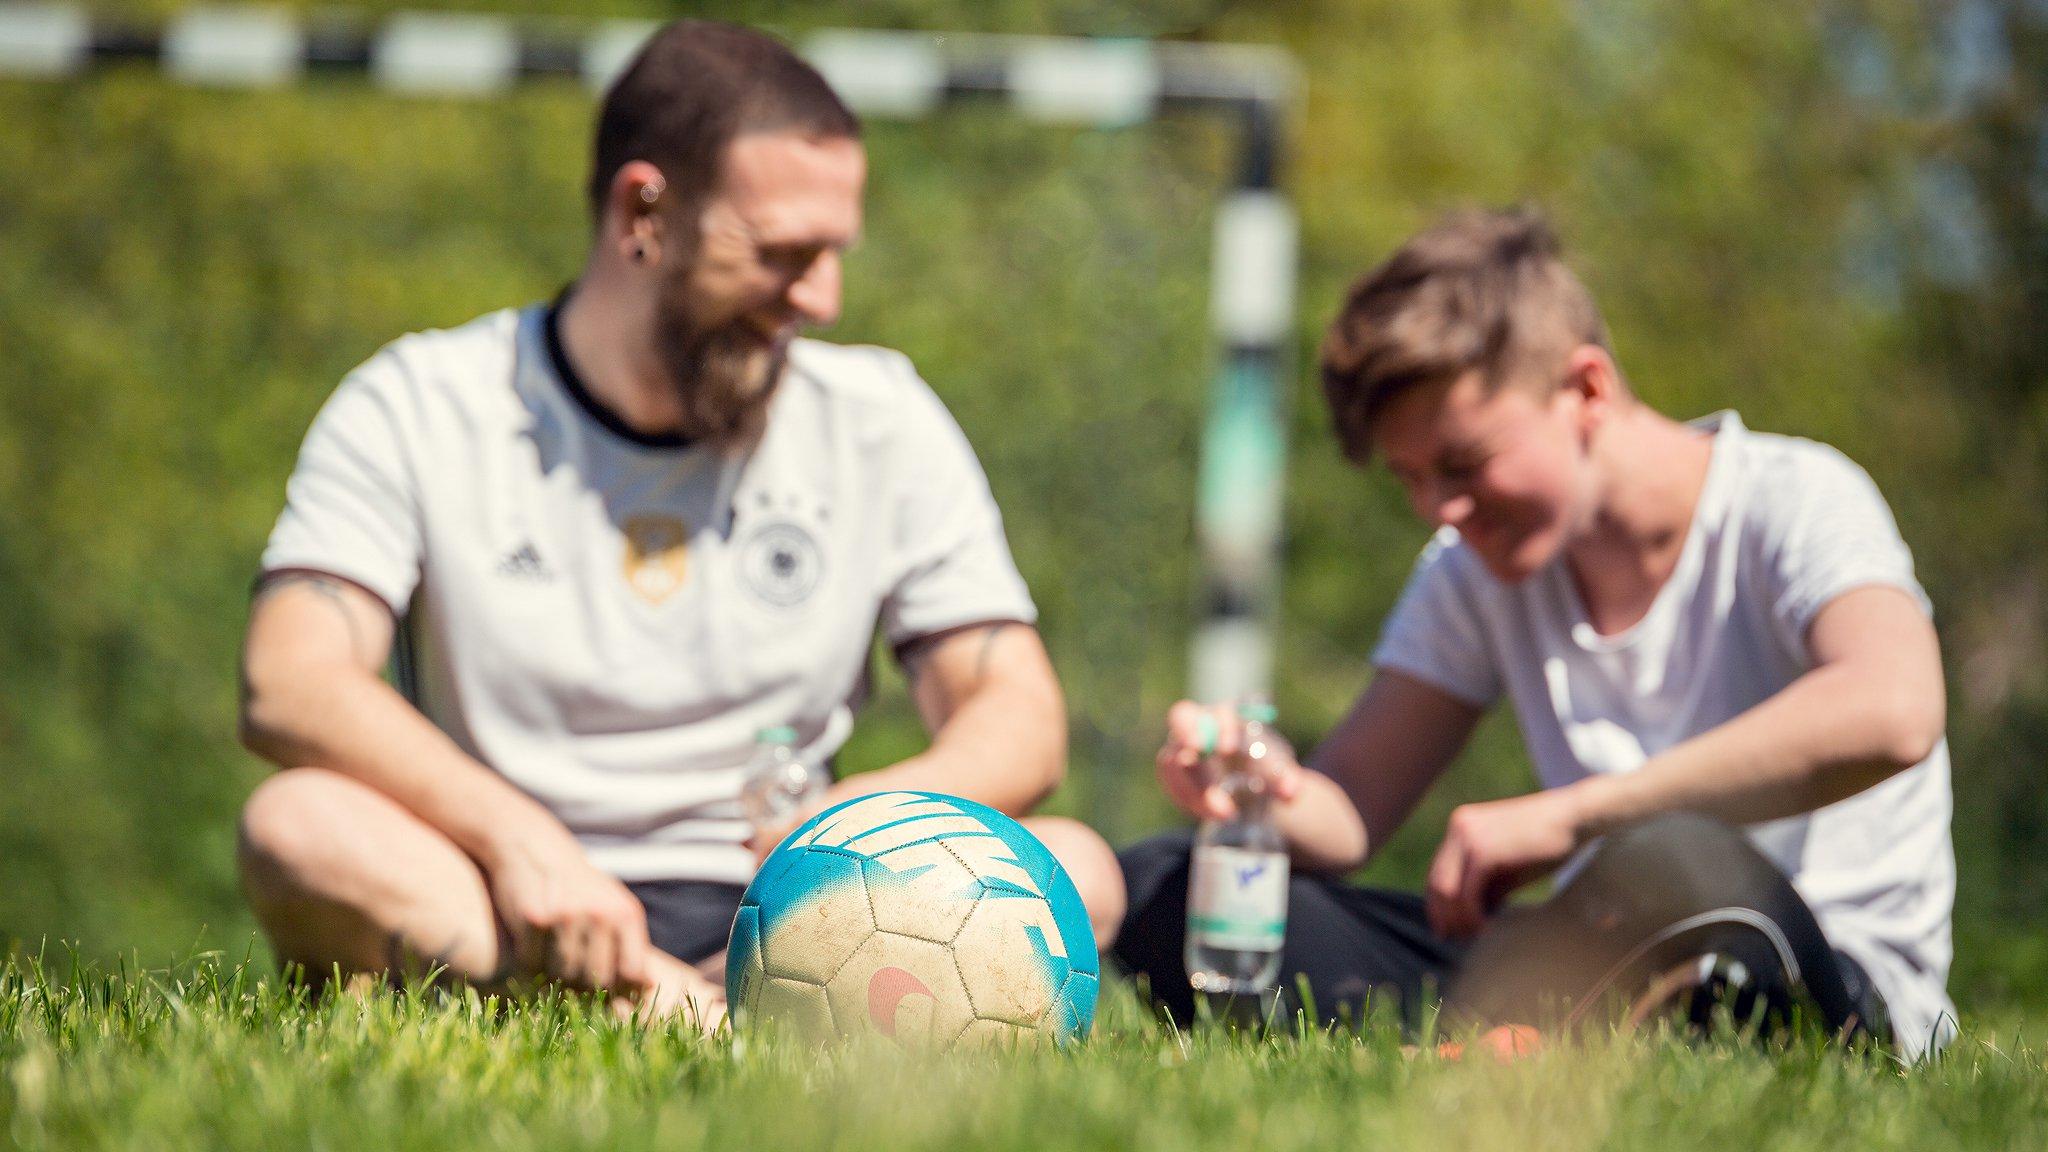 Spielt Fussball am Vatertag